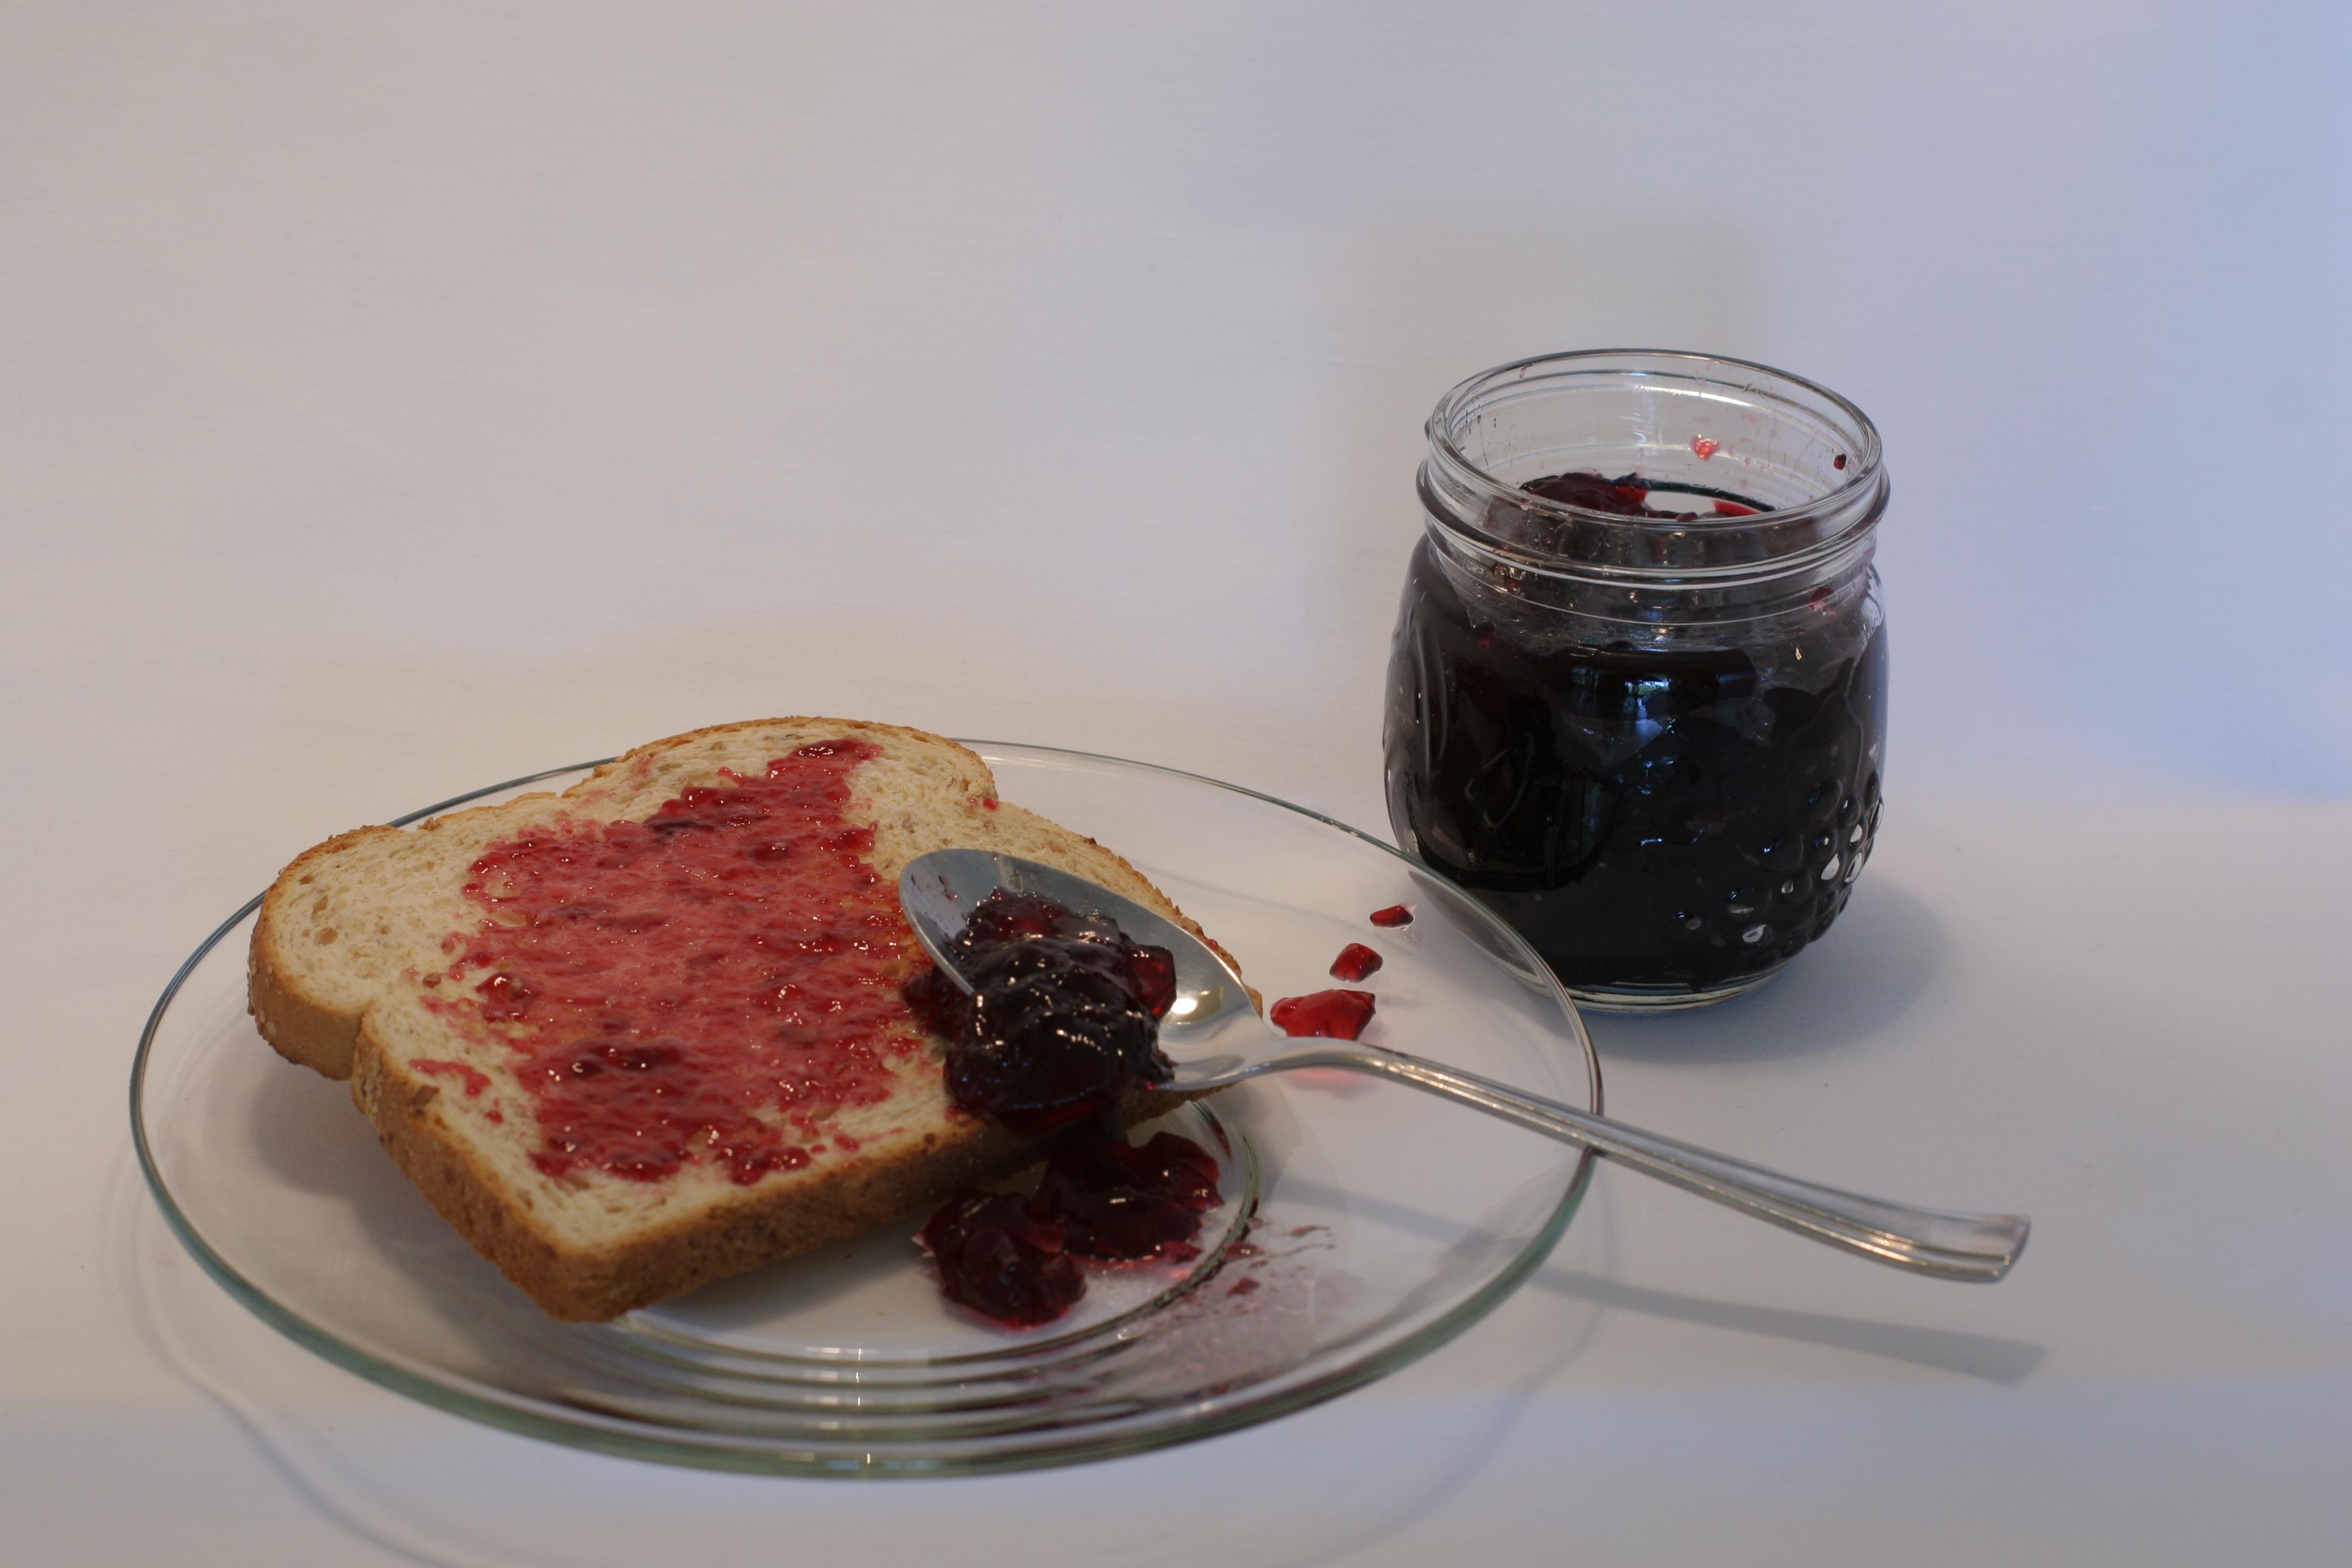 Alaska wild berry preserves are a great treat